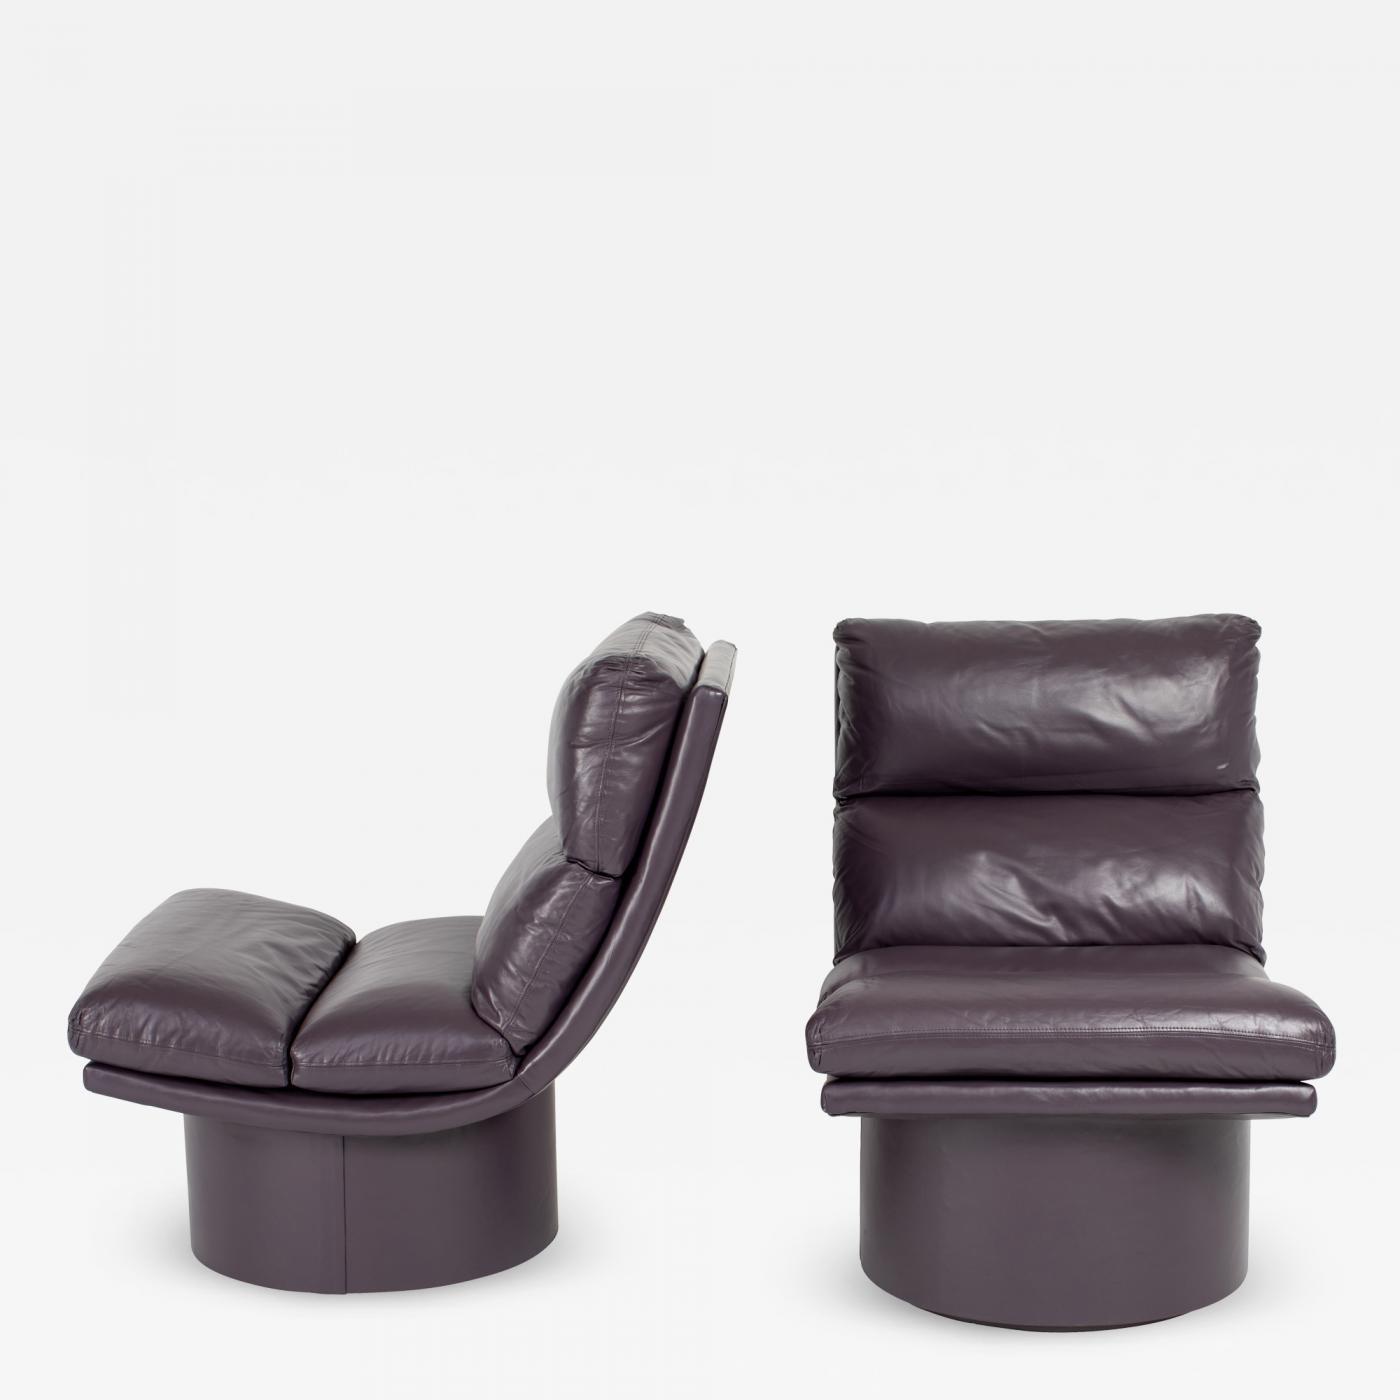 Enjoyable Eggplant Leather Scoop Chairs On Swivel Bases Circa 1980S Evergreenethics Interior Chair Design Evergreenethicsorg